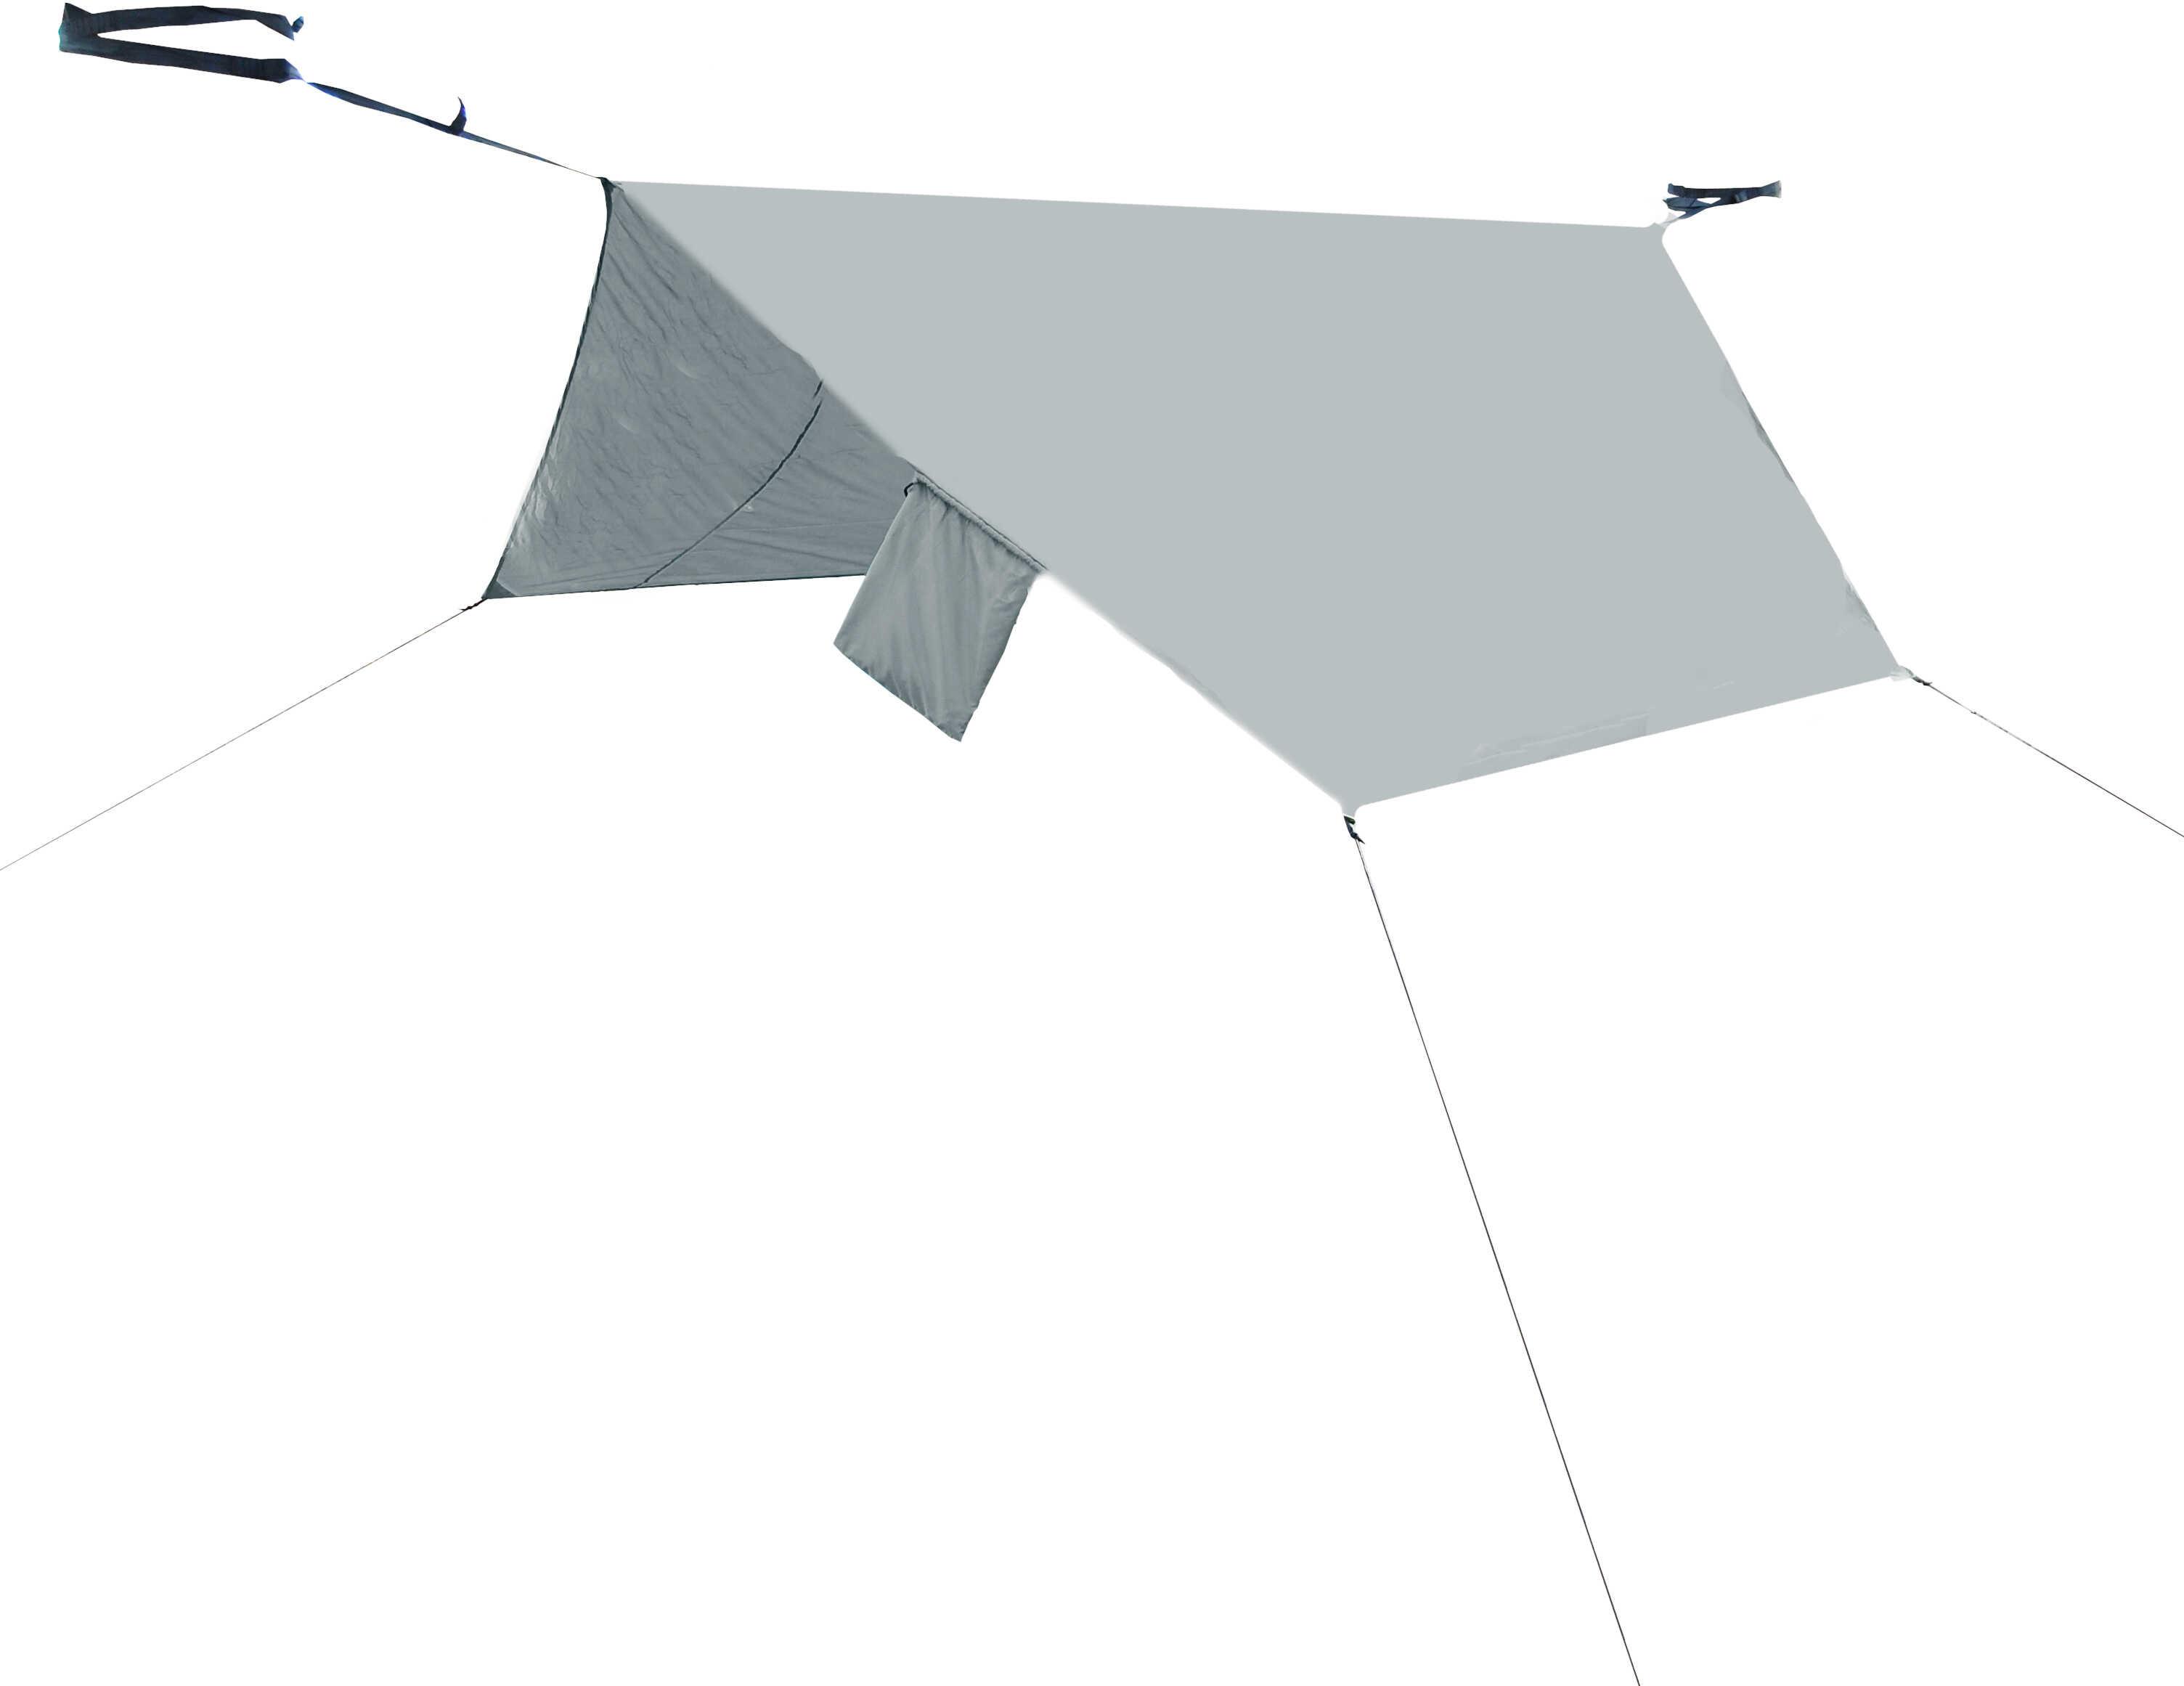 PahaQue Universal Hammock Rainfly for Single Hammock